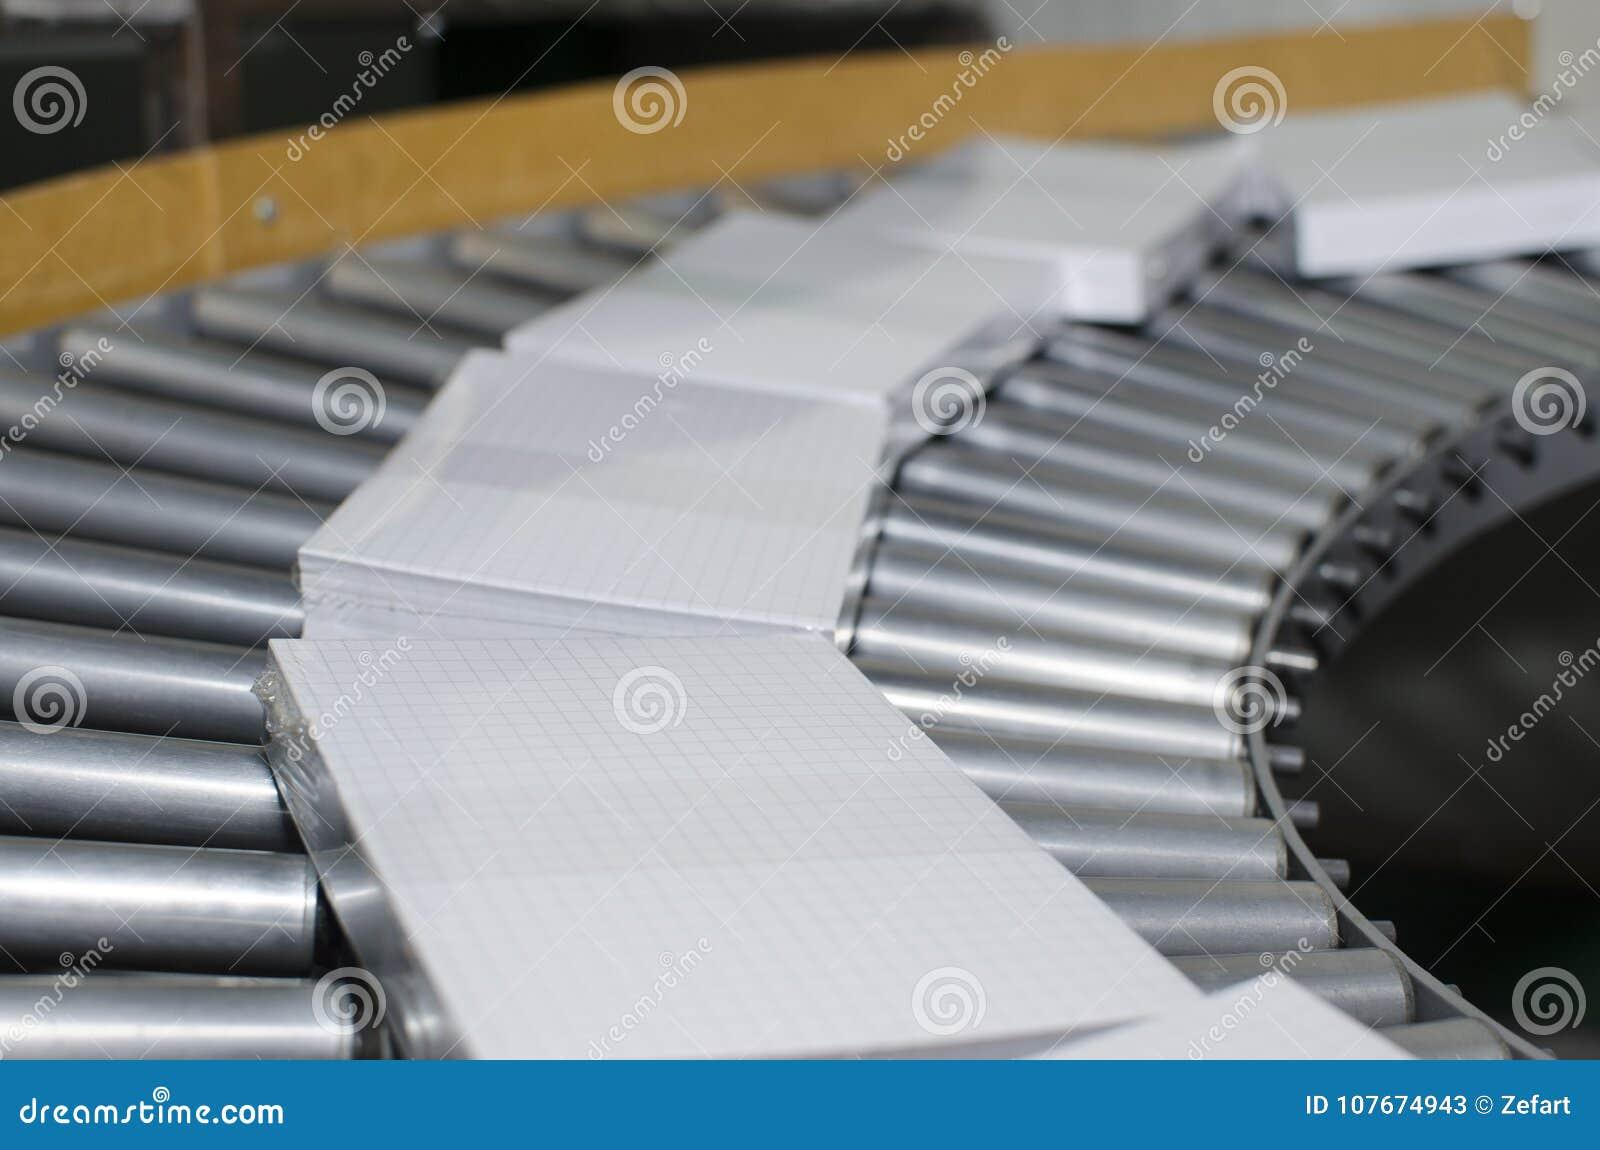 Print shop stock image  Image of press, work, stock - 107674943